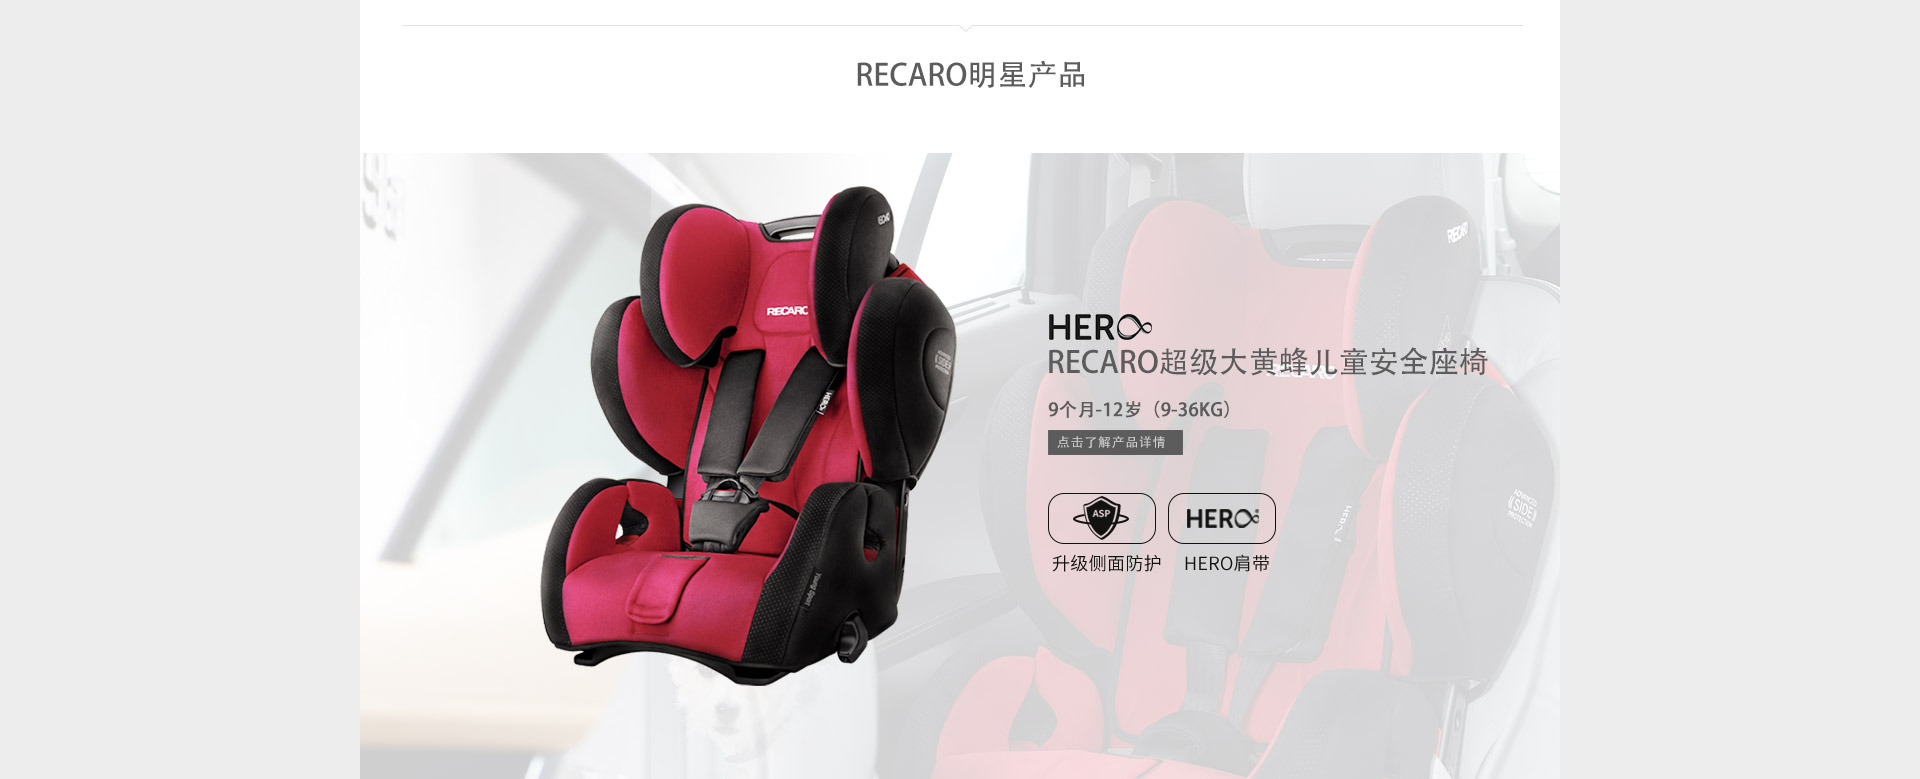 RECARO超级大黄蜂安全坐椅